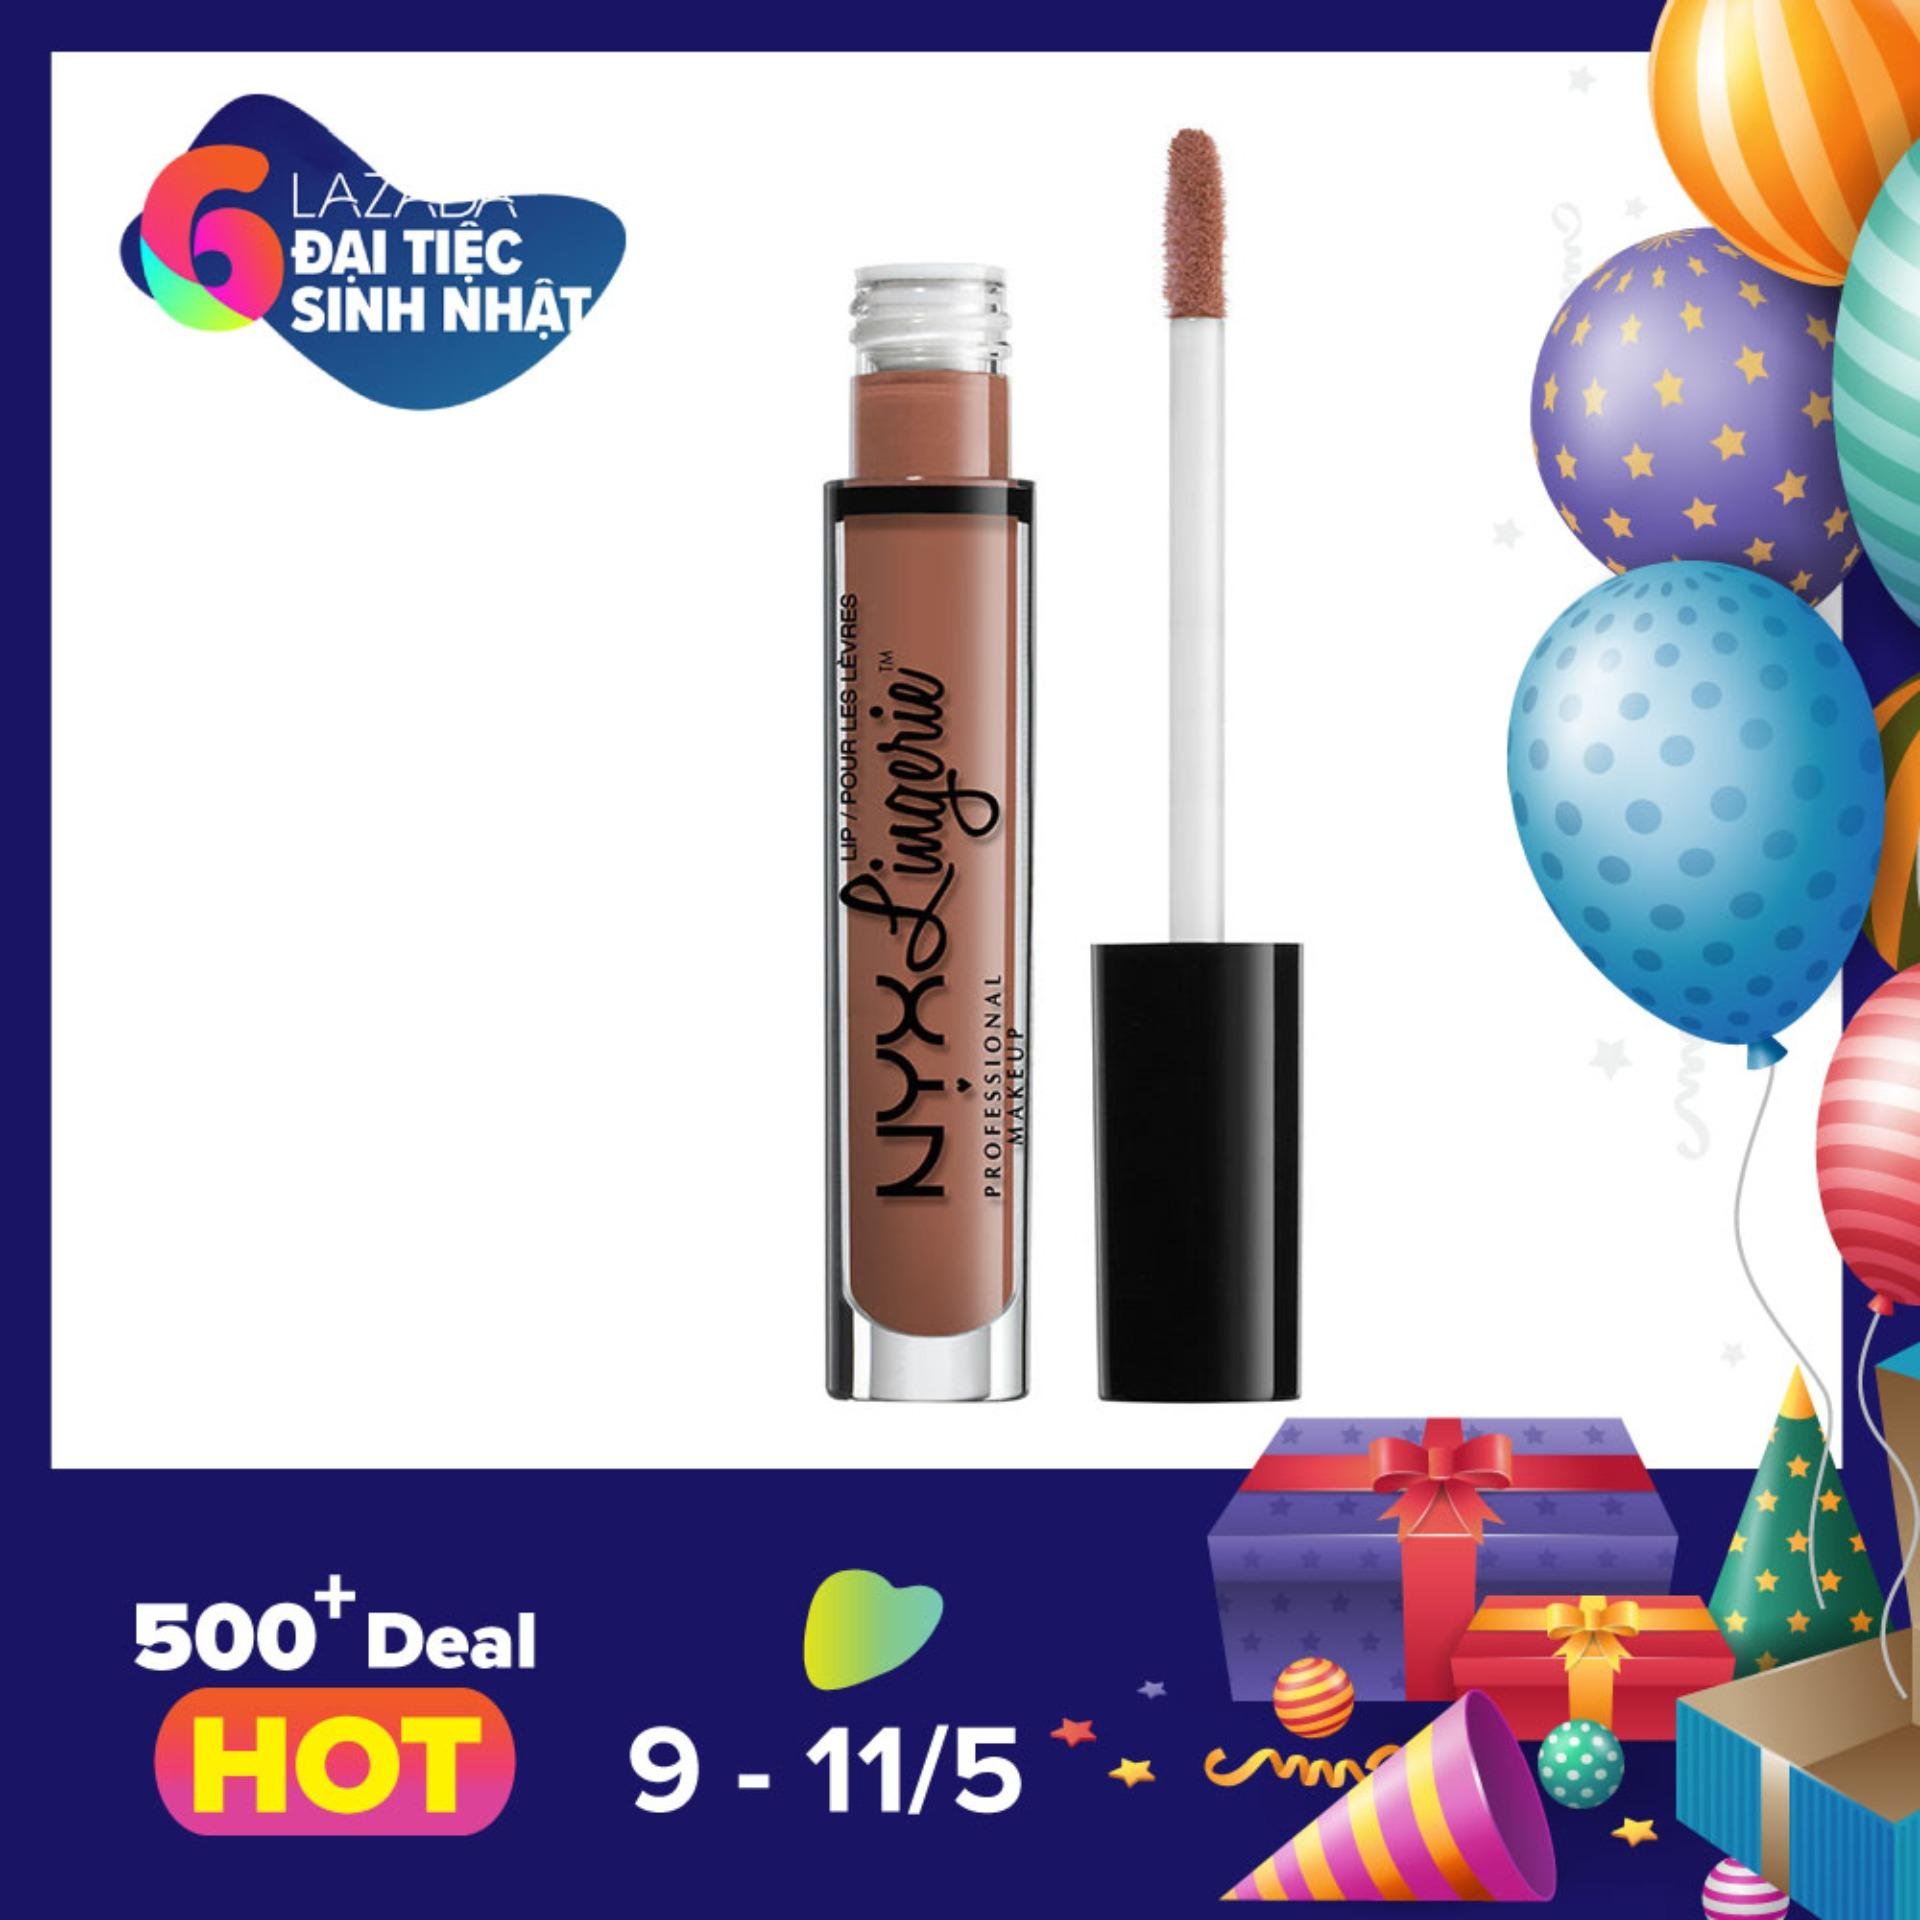 Cửa Hàng Son Kem Li Nyx Professional Makeup Lingerie Liquid Matte Lipstick Lipli08 Bedtime Flirt Trực Tuyến